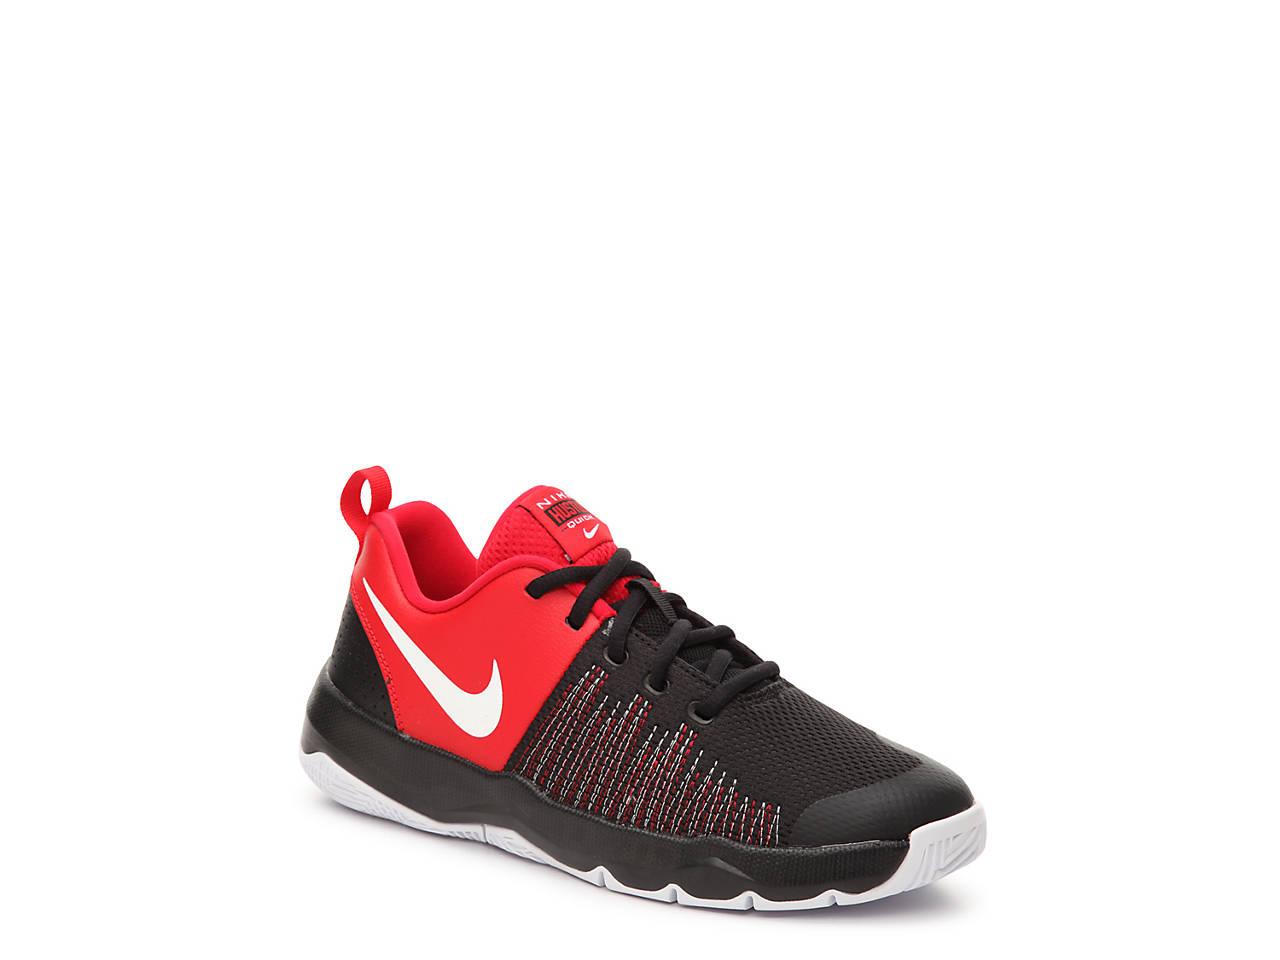 0ded2dae7da5 Nike Team Hustle Quick Youth Basketball Shoe Kids Shoes